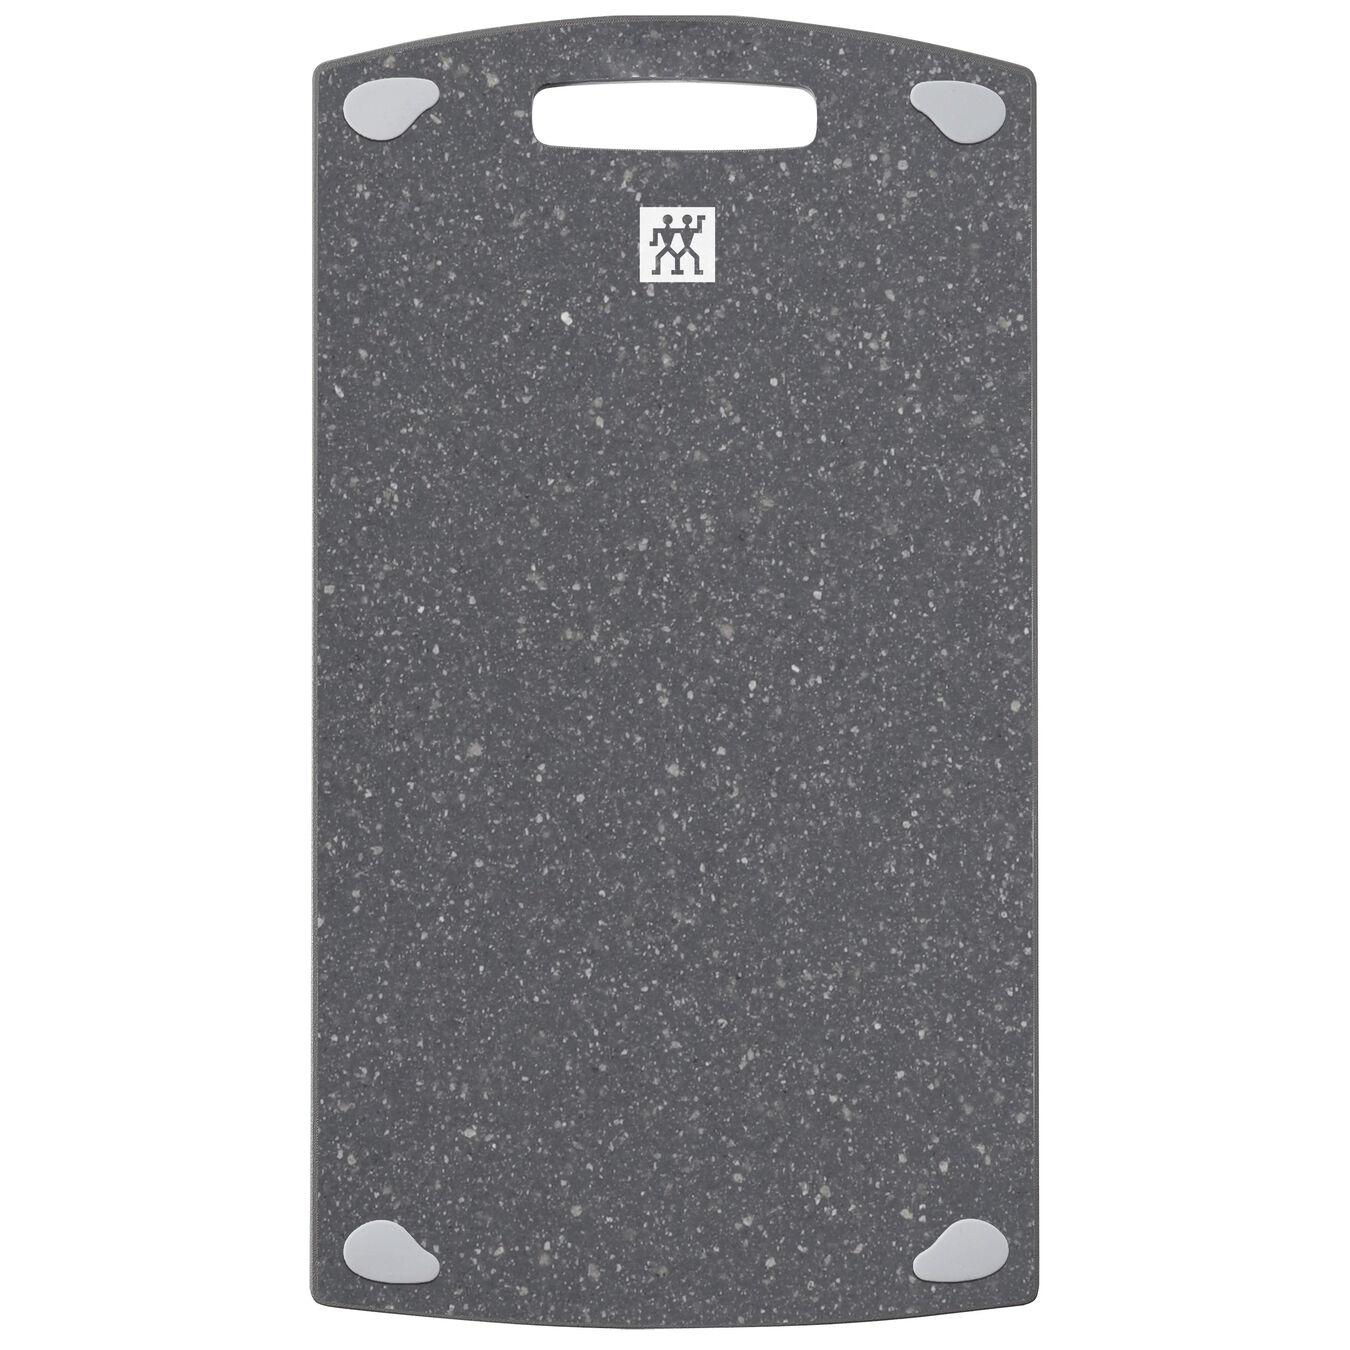 2 pc. Cutting board set, Plastic | 36 cm x 20 cm & 37 cm x 27 cm 36 cm x 20 cm,,large 6